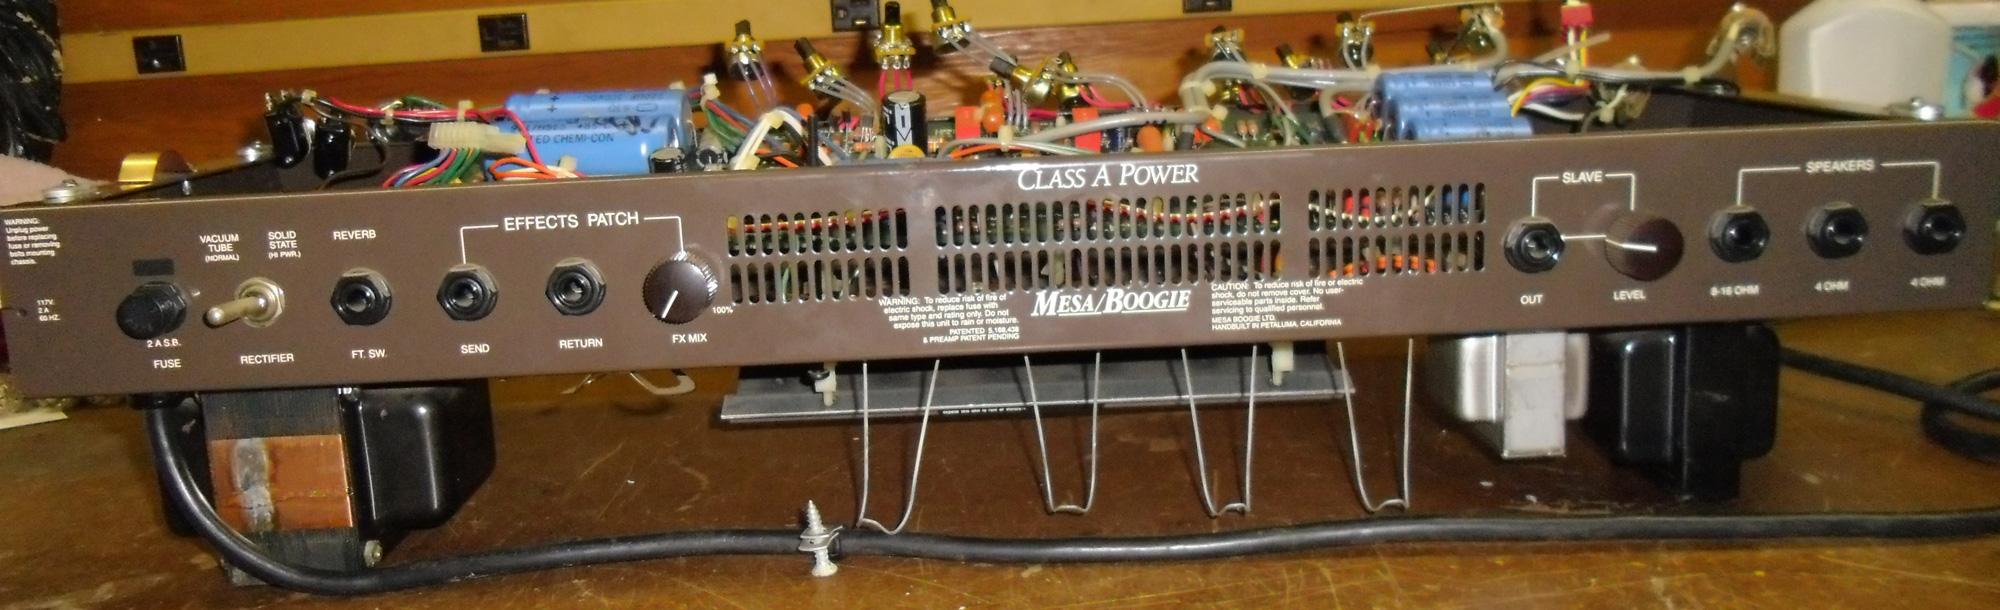 Mesa Boogie Maverick Dual Rectifier Pcb Electronics